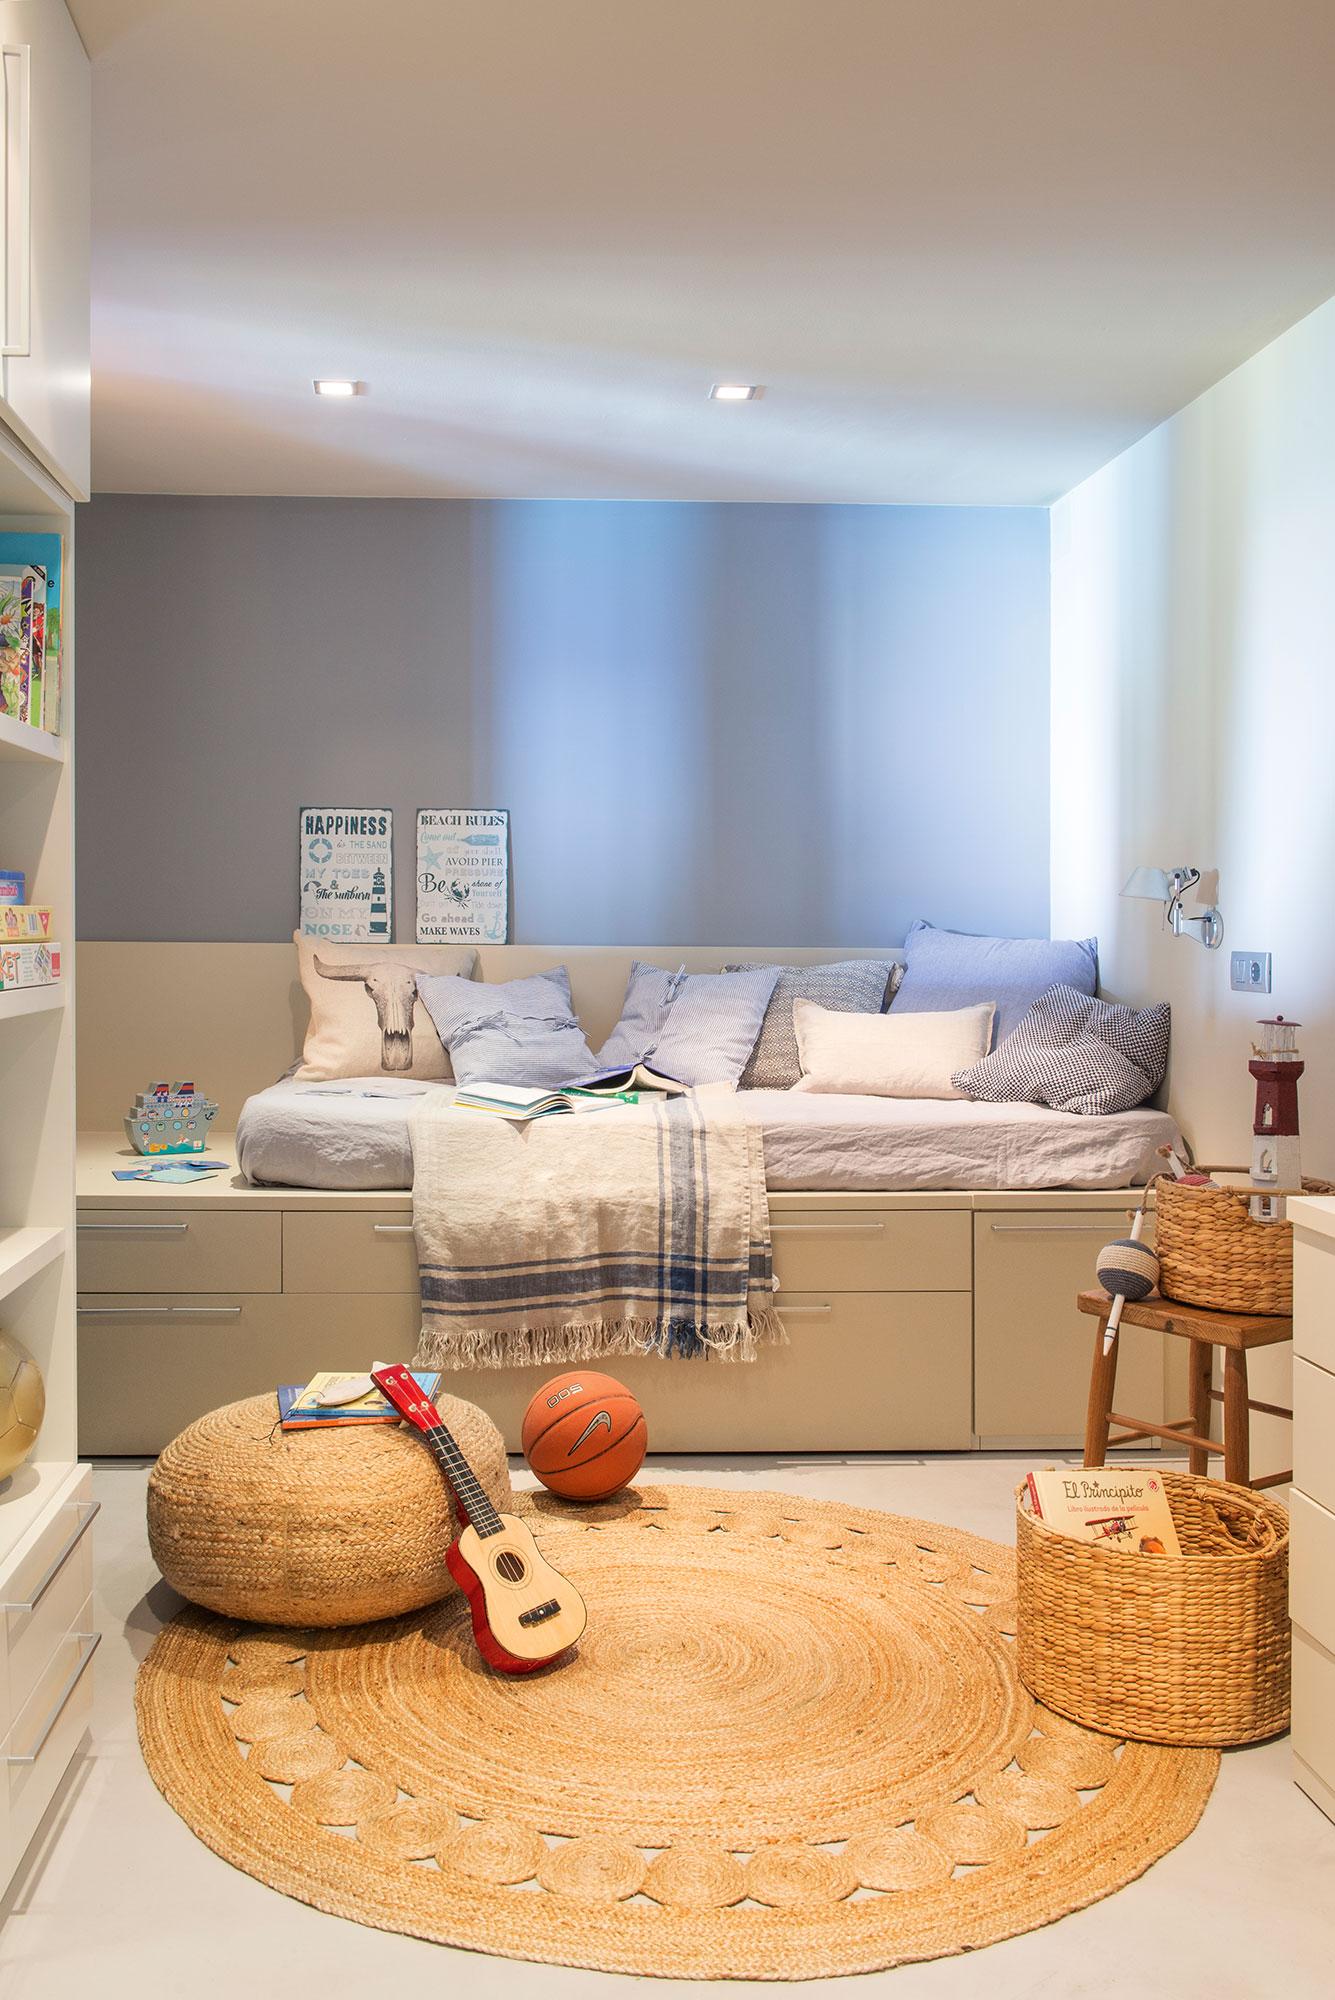 Dormitorios infantiles 7 buenas ideas para compartir for Dormitorio juvenil cama alta